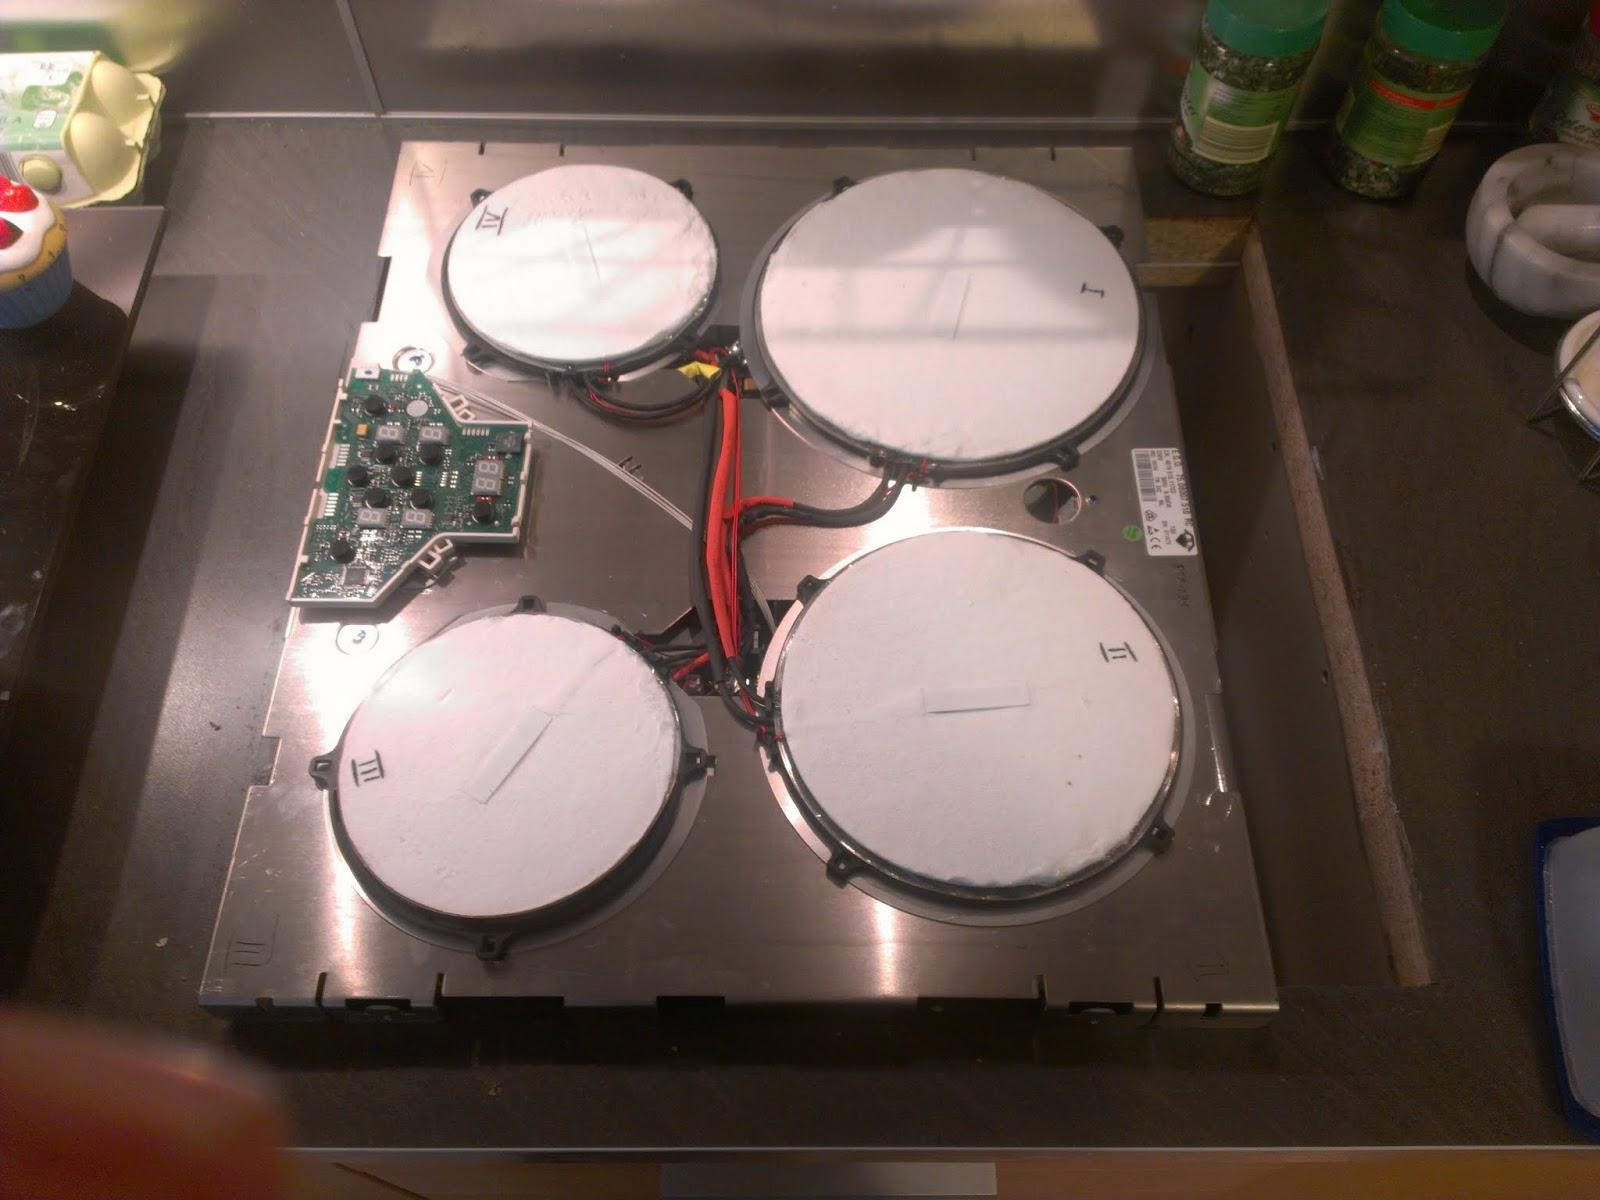 Siemens Ceranfeld Reparieren. siemens kochfeld reparieren ...